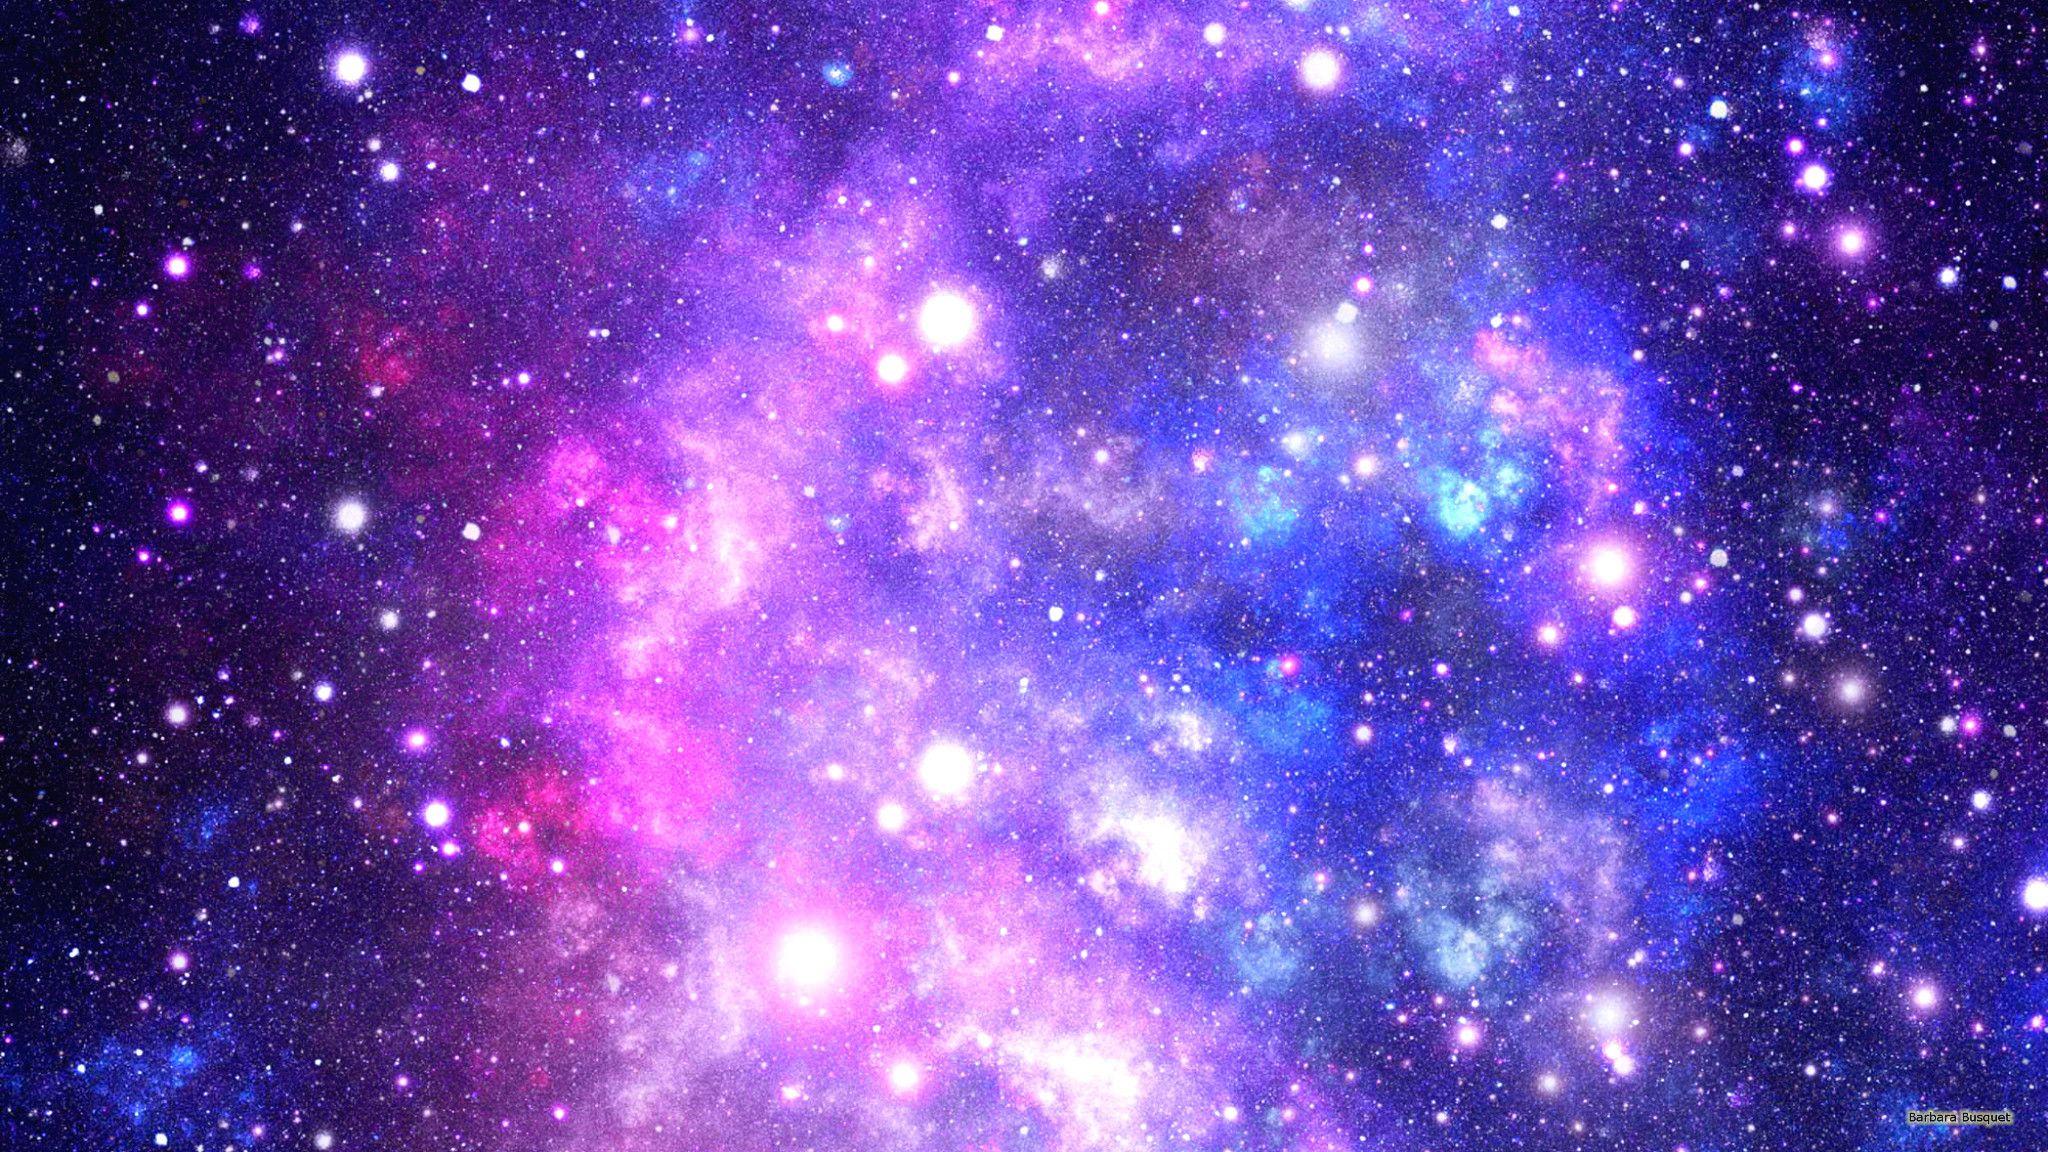 Galaxy Wallpaper No Copyright